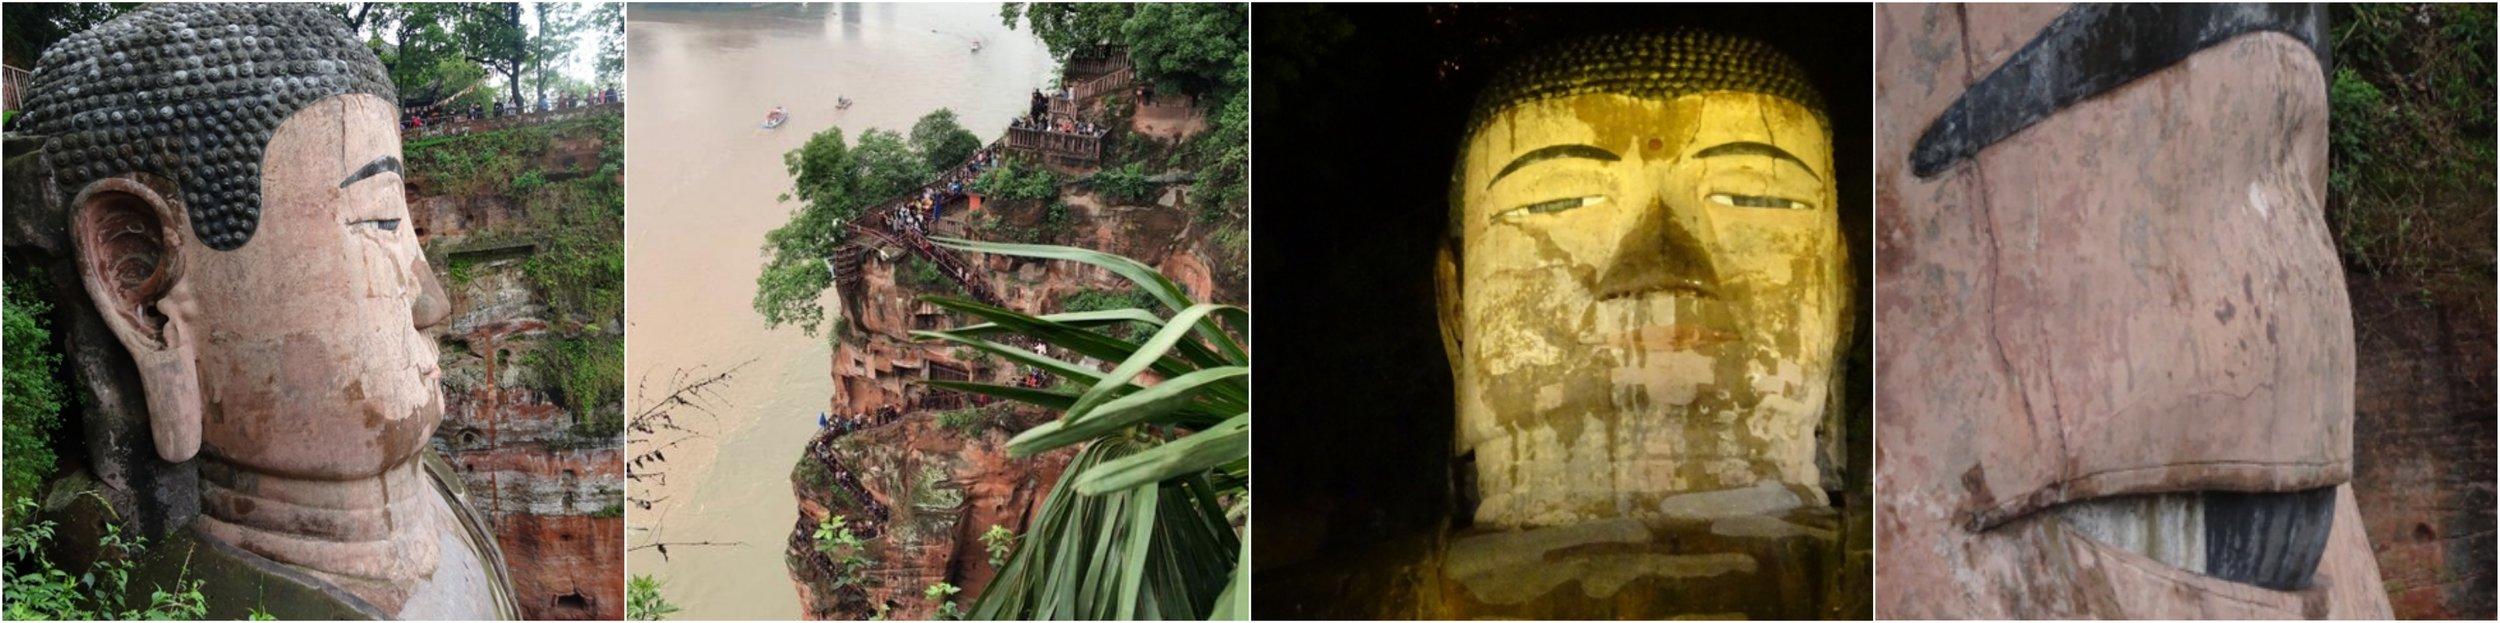 Grand Buddha.jpg